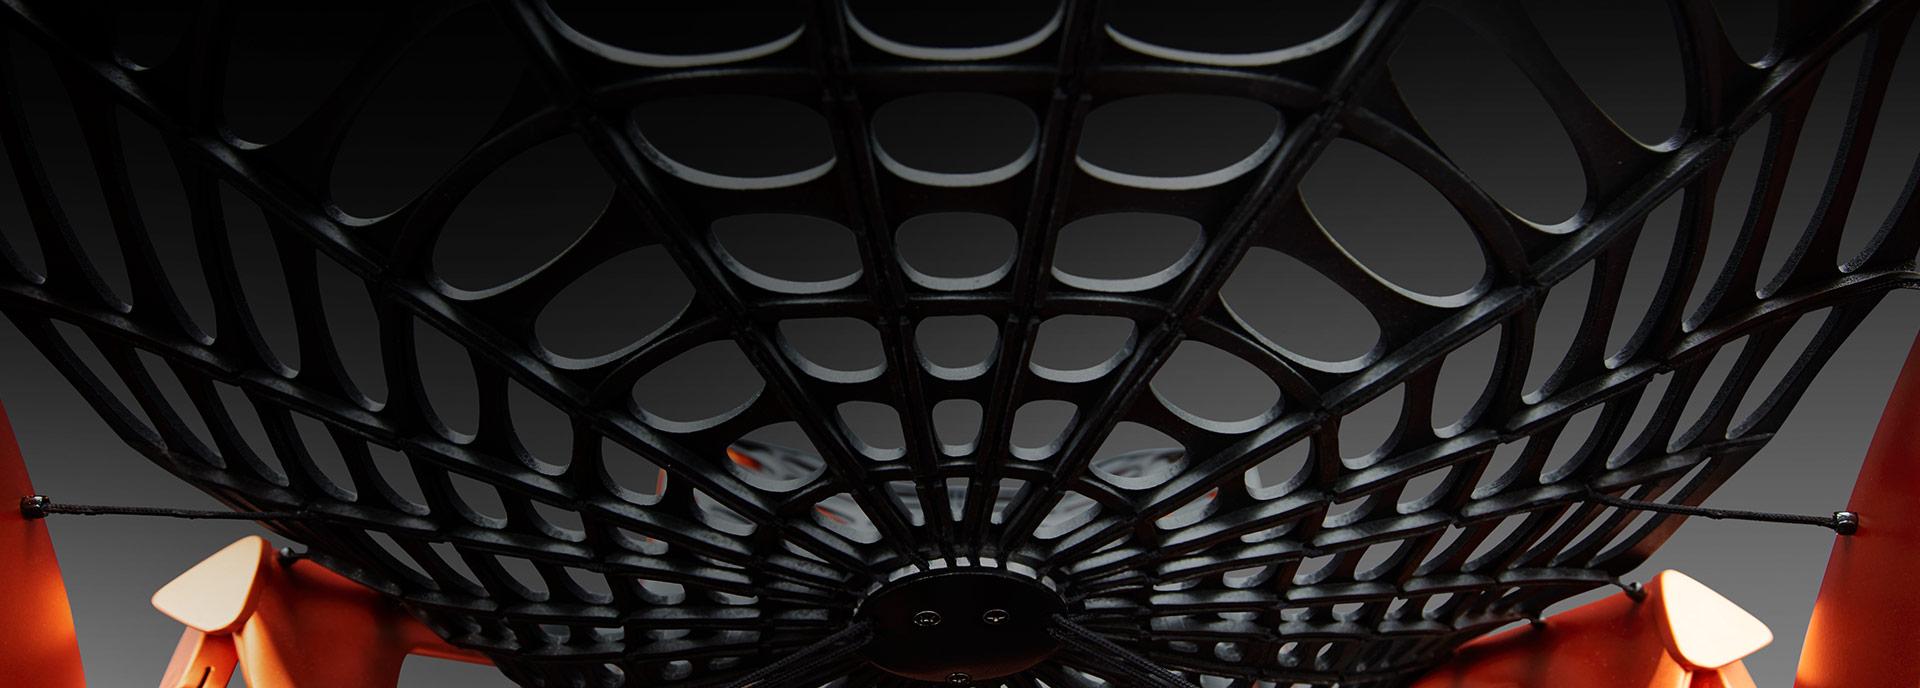 2016 lexus kinetic seat concept hero seatback rear